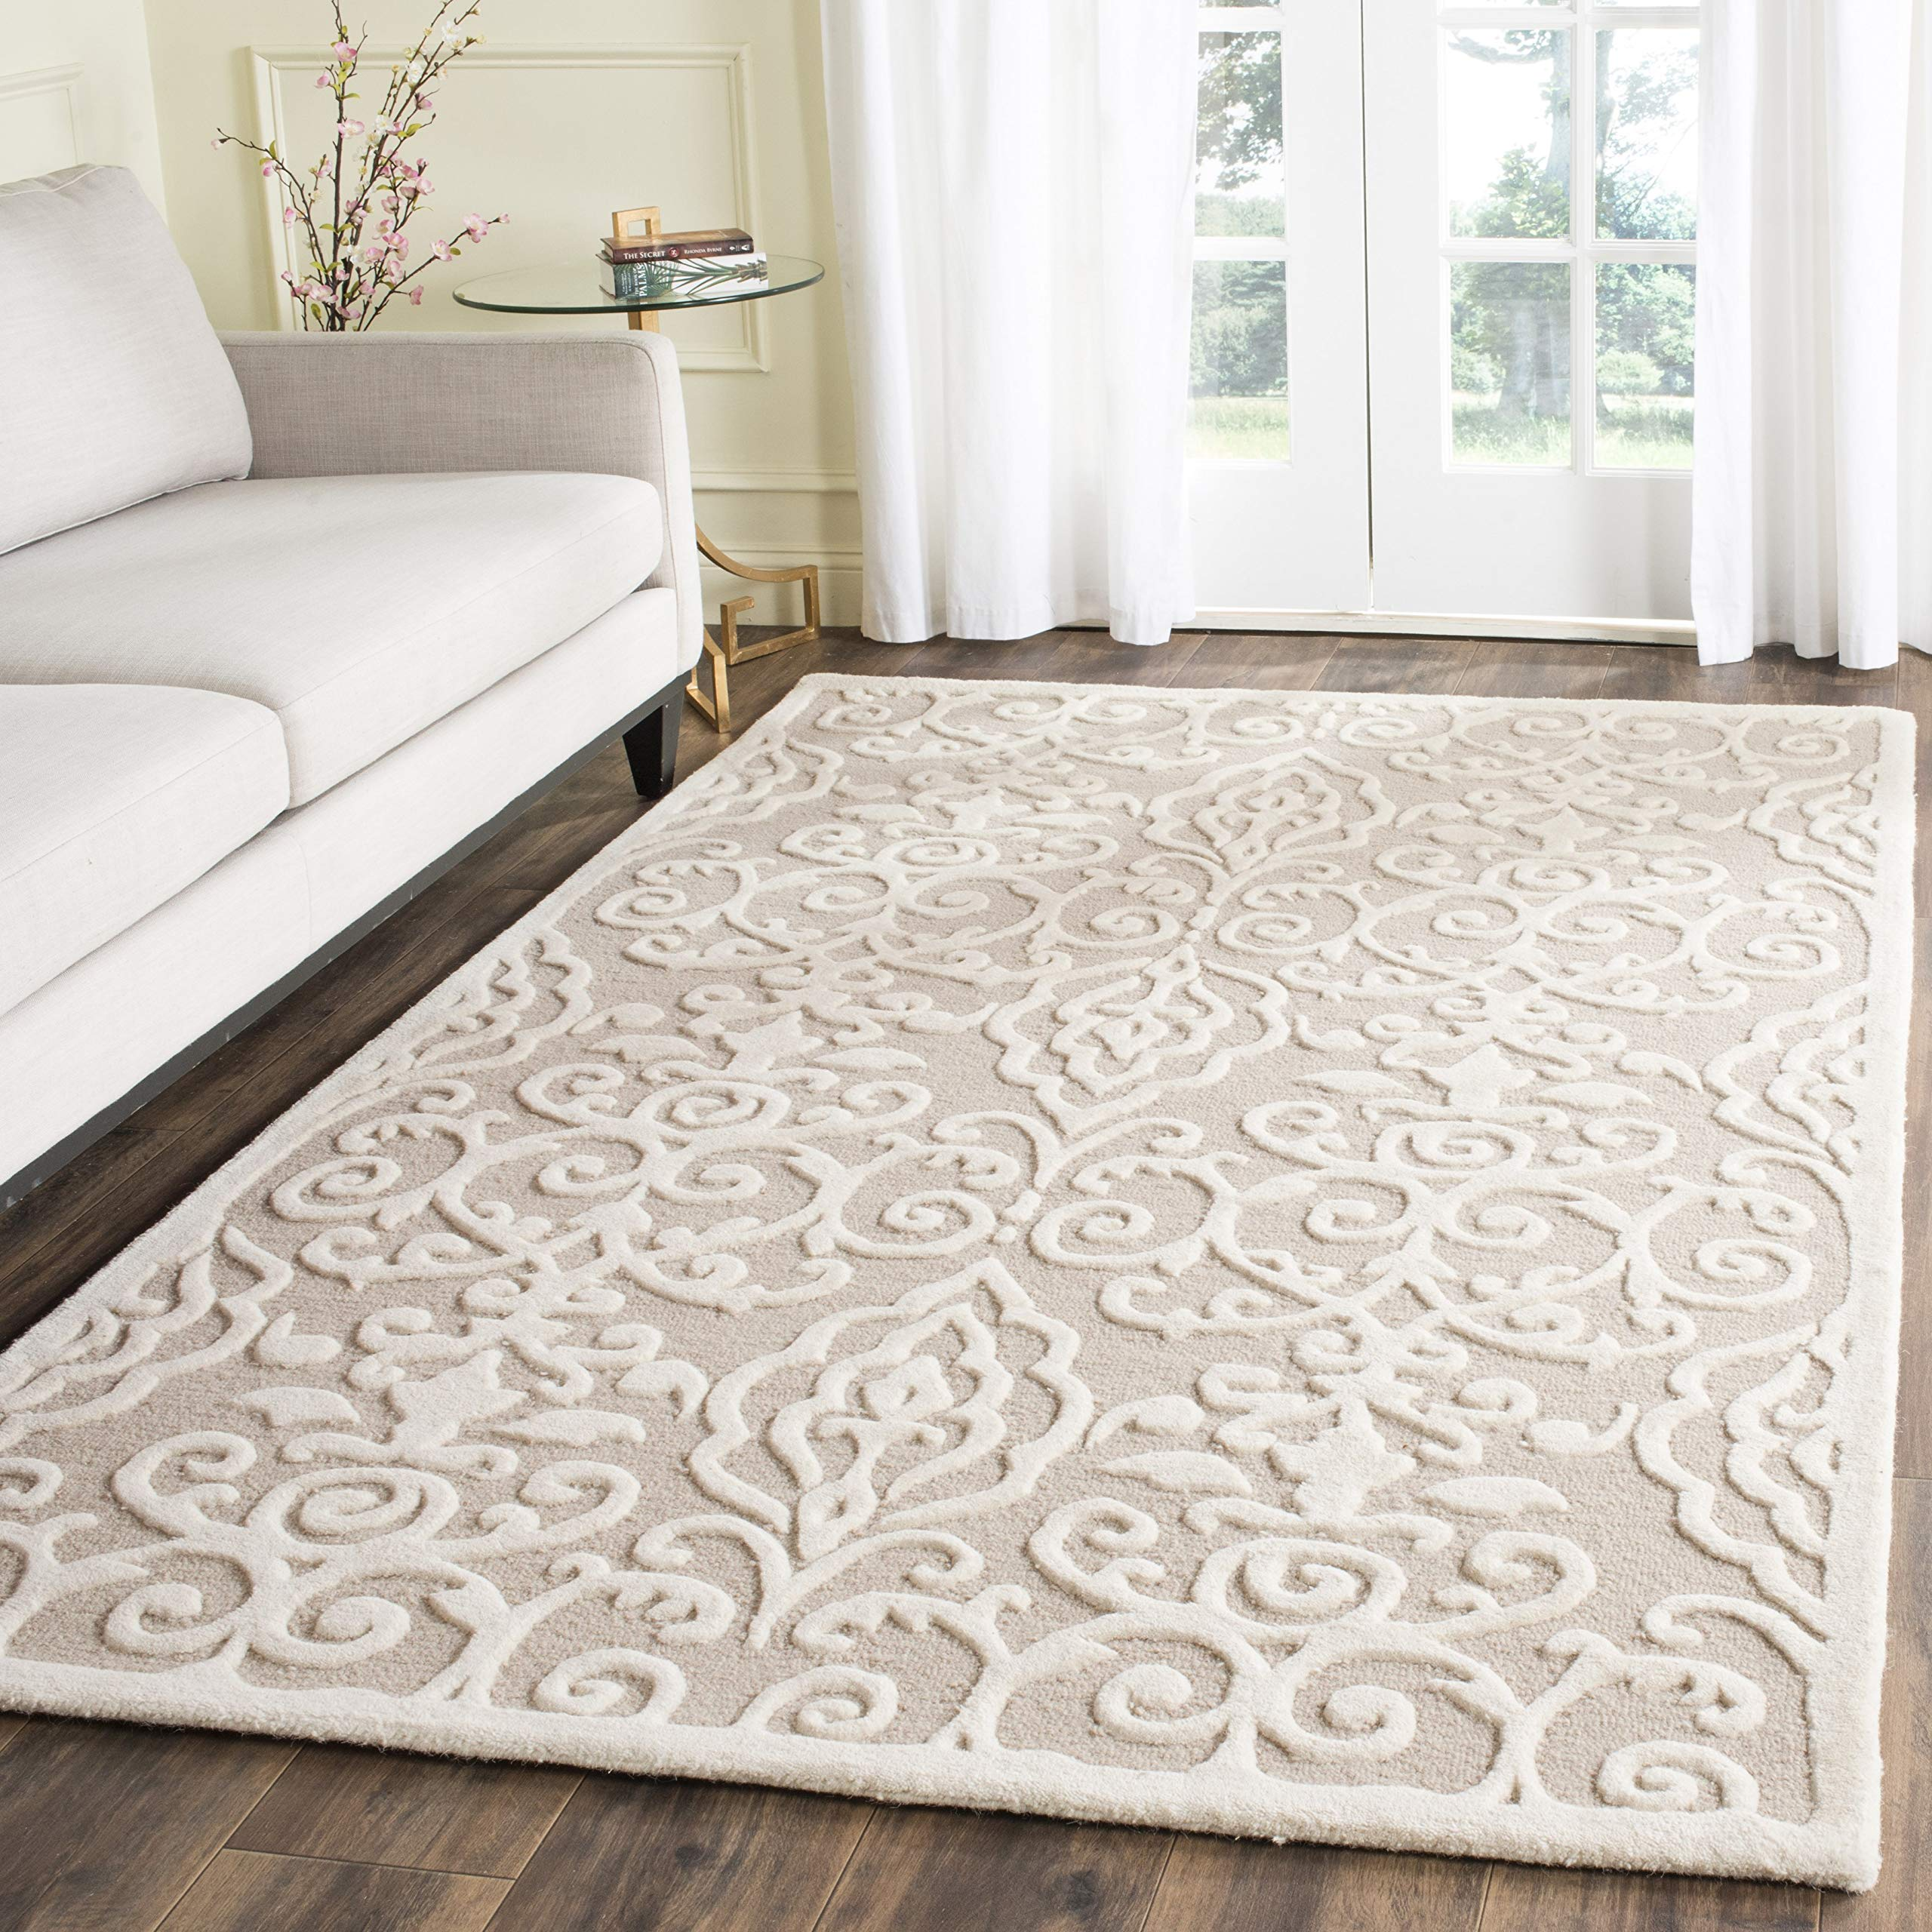 Amazon Com Safavieh Martha Stewart Collection Msr4324b Handmade Marais Wool Area Rug 5 X 8 Fledgling Furniture Decor